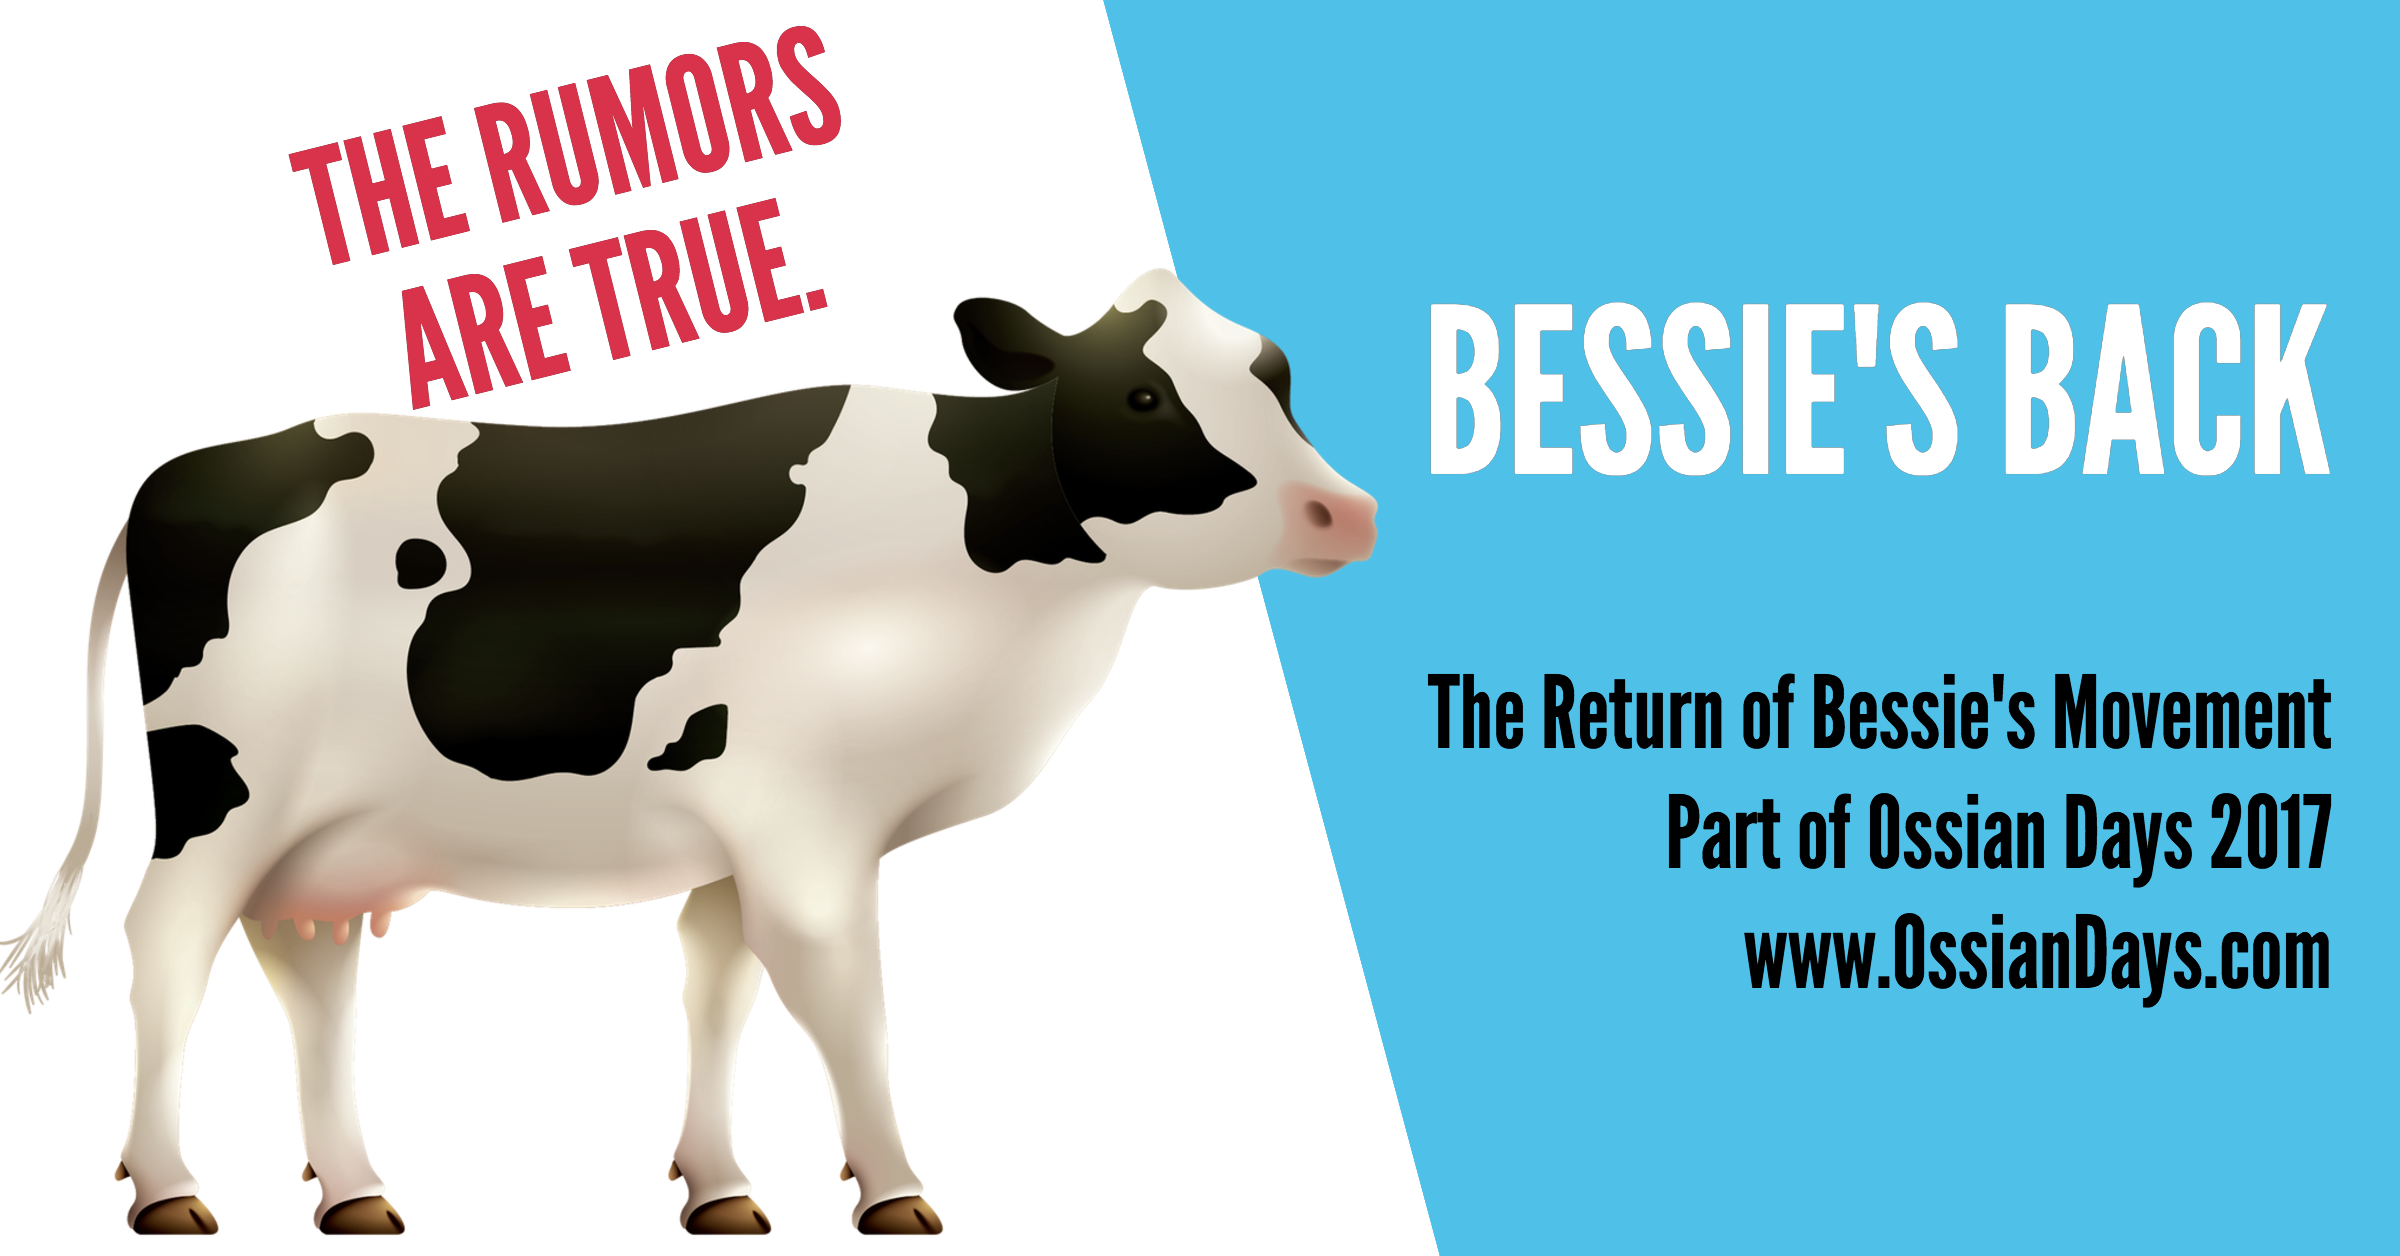 Bessie's Movement Returns to Ossian Days 2017